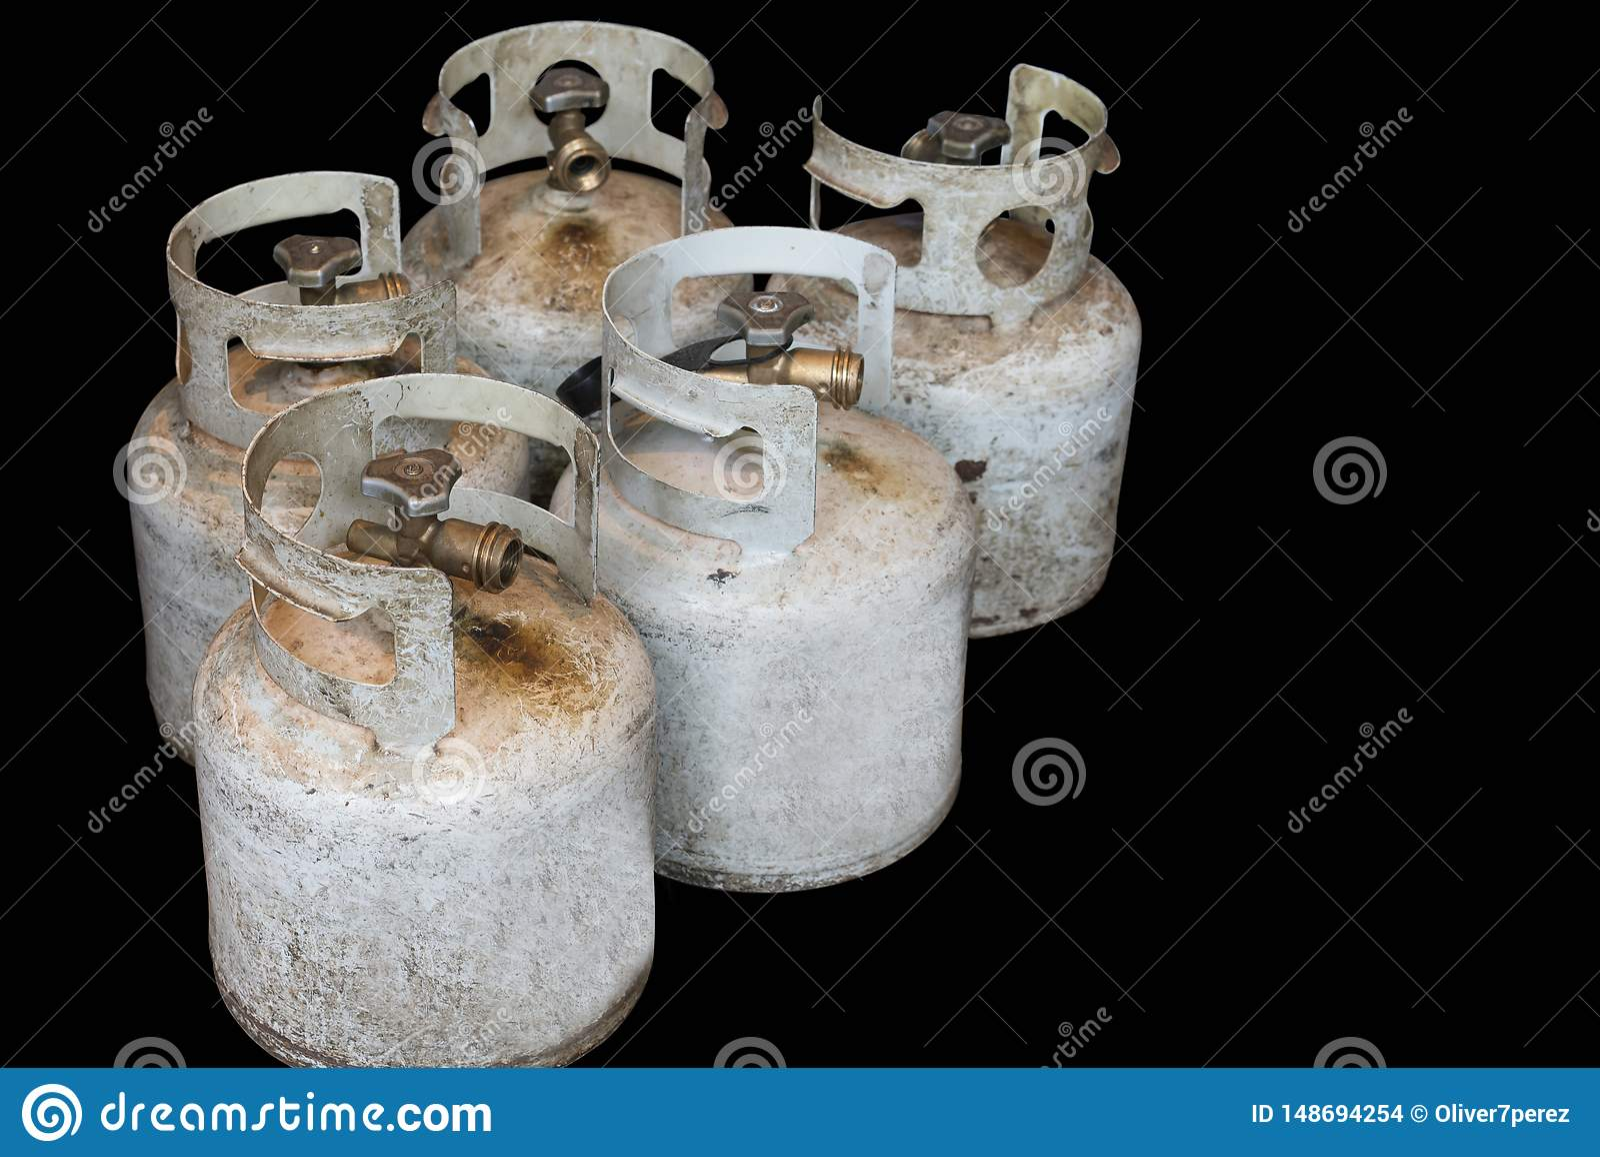 Propaancilinders die kokende brandstof houden